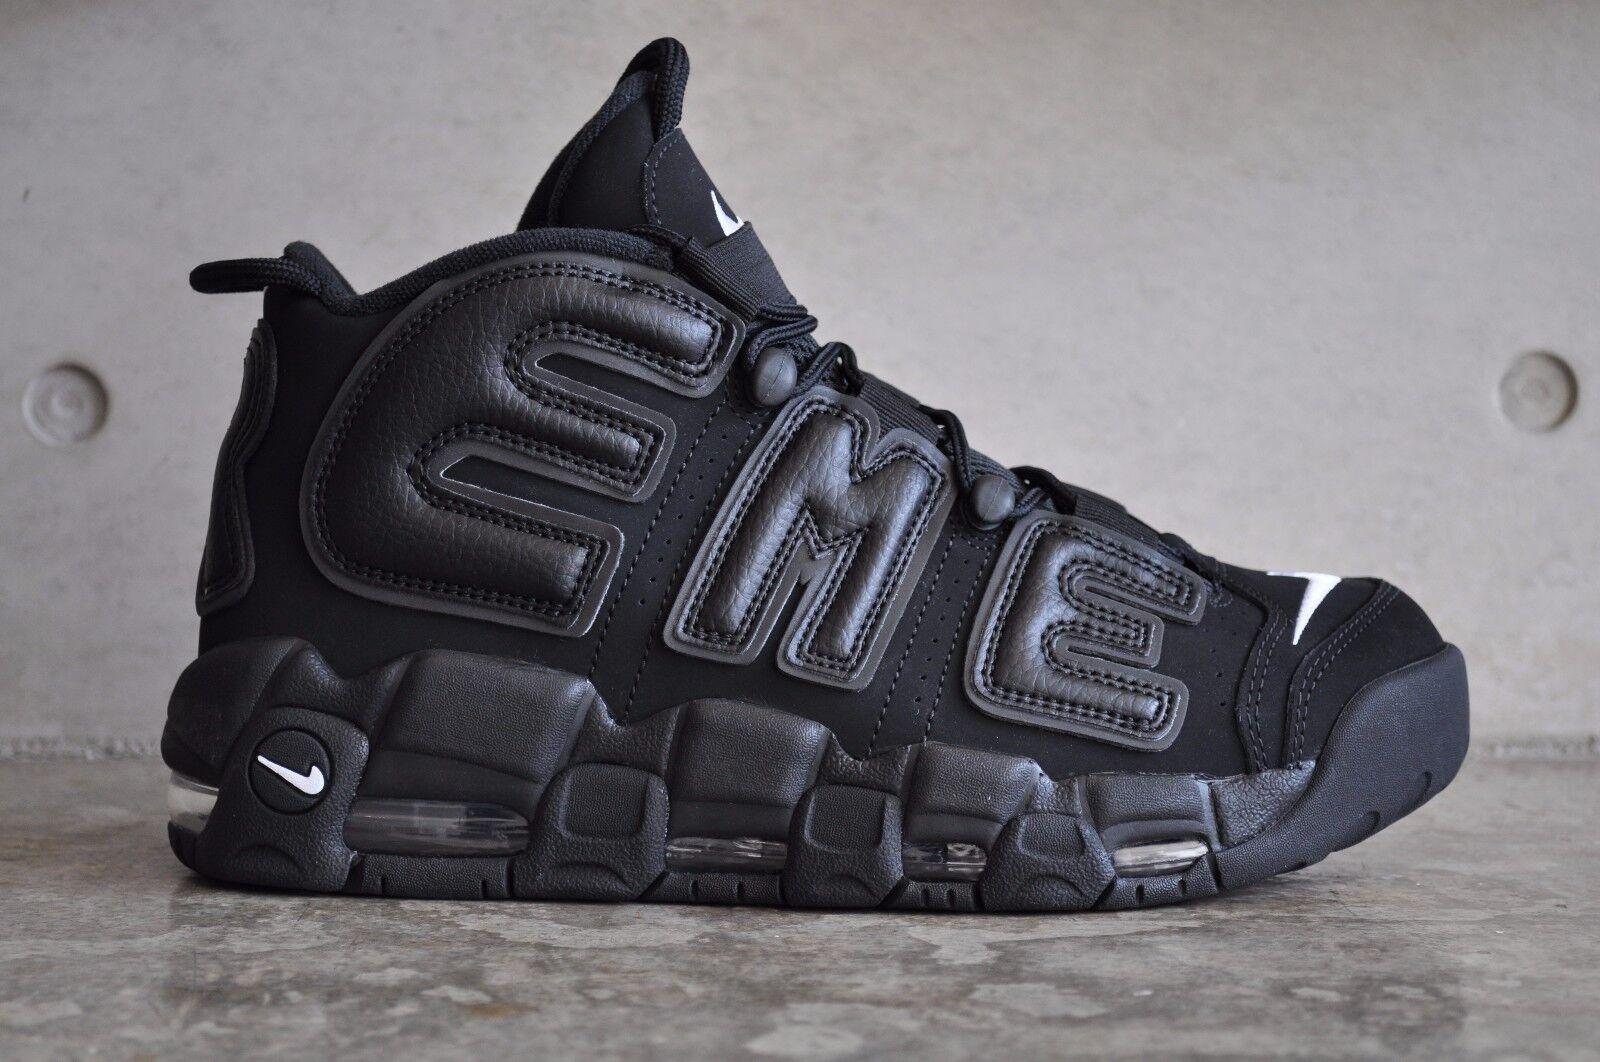 Nike Uptempo Uptempo Uptempo Supreme Air MoreNegro/NegroBlanco a8dbb3